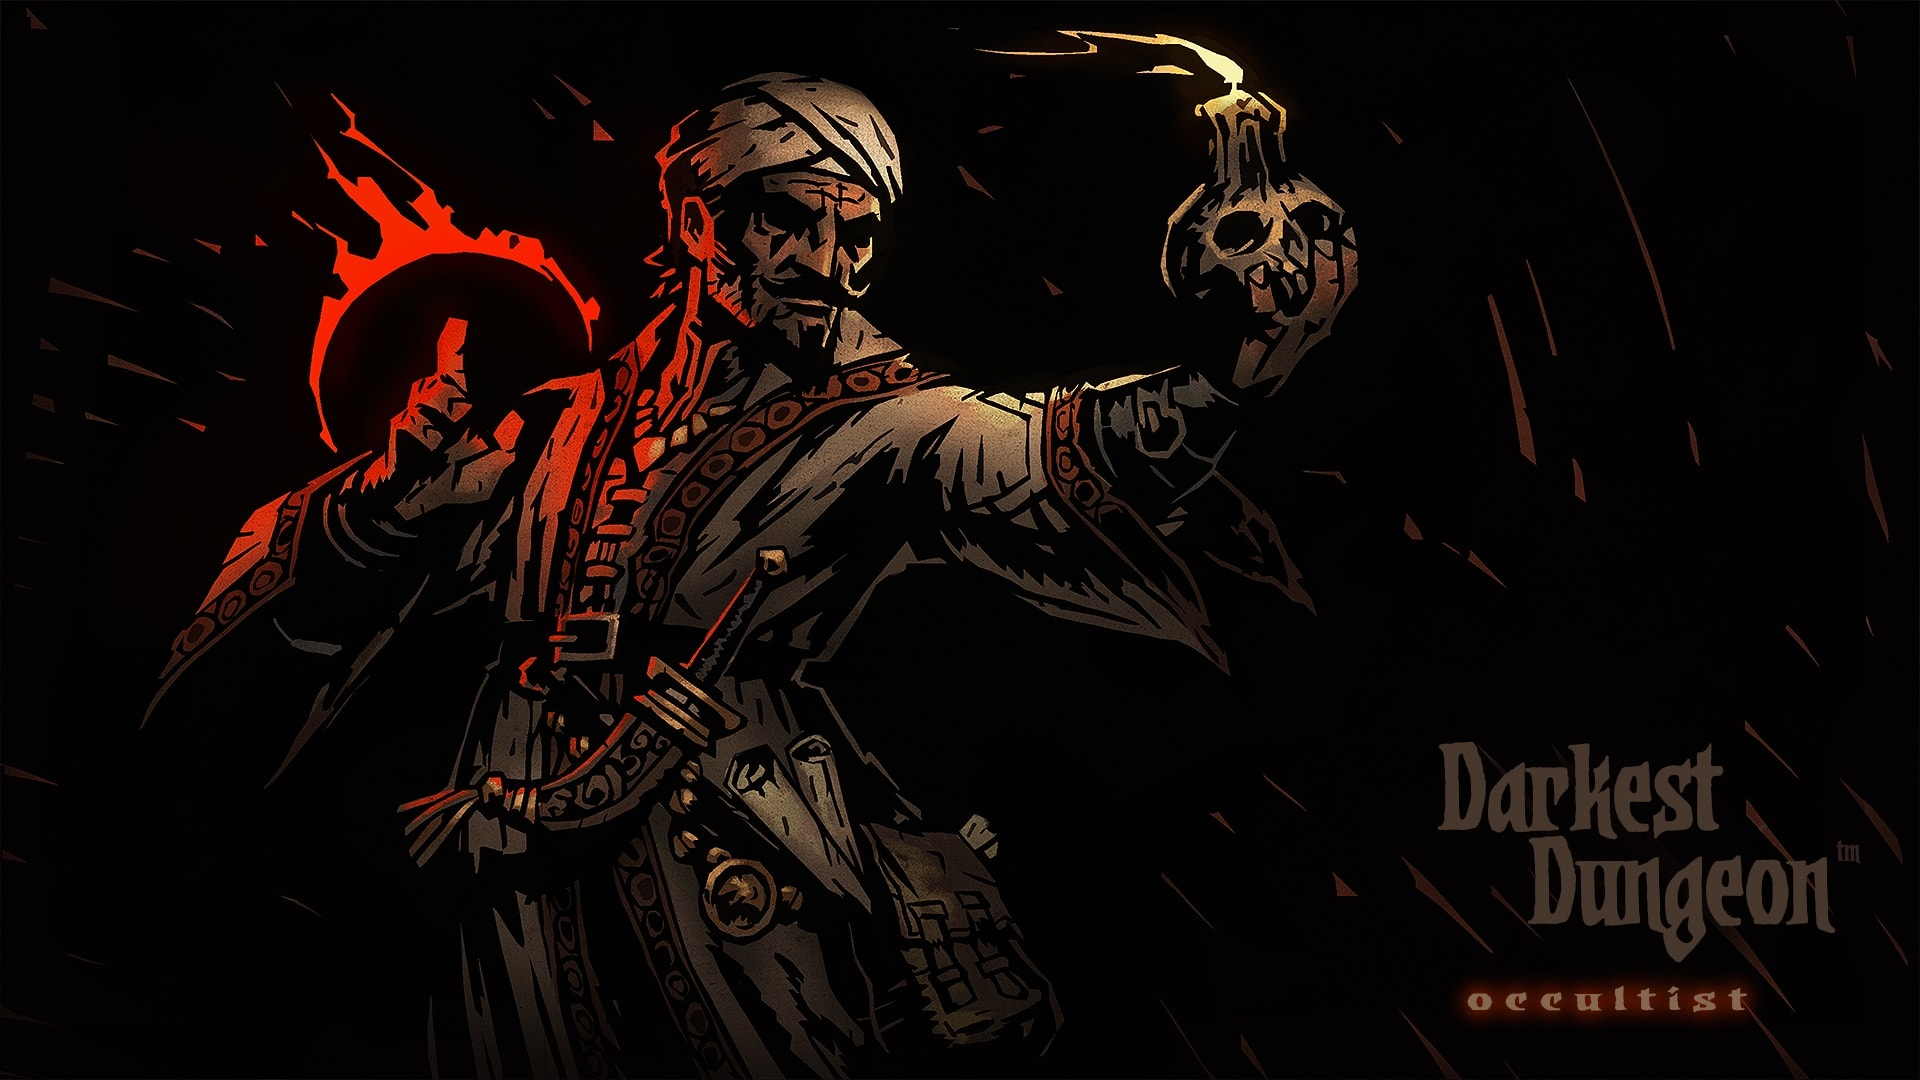 Darkest Dungeon Widescreen for desktop